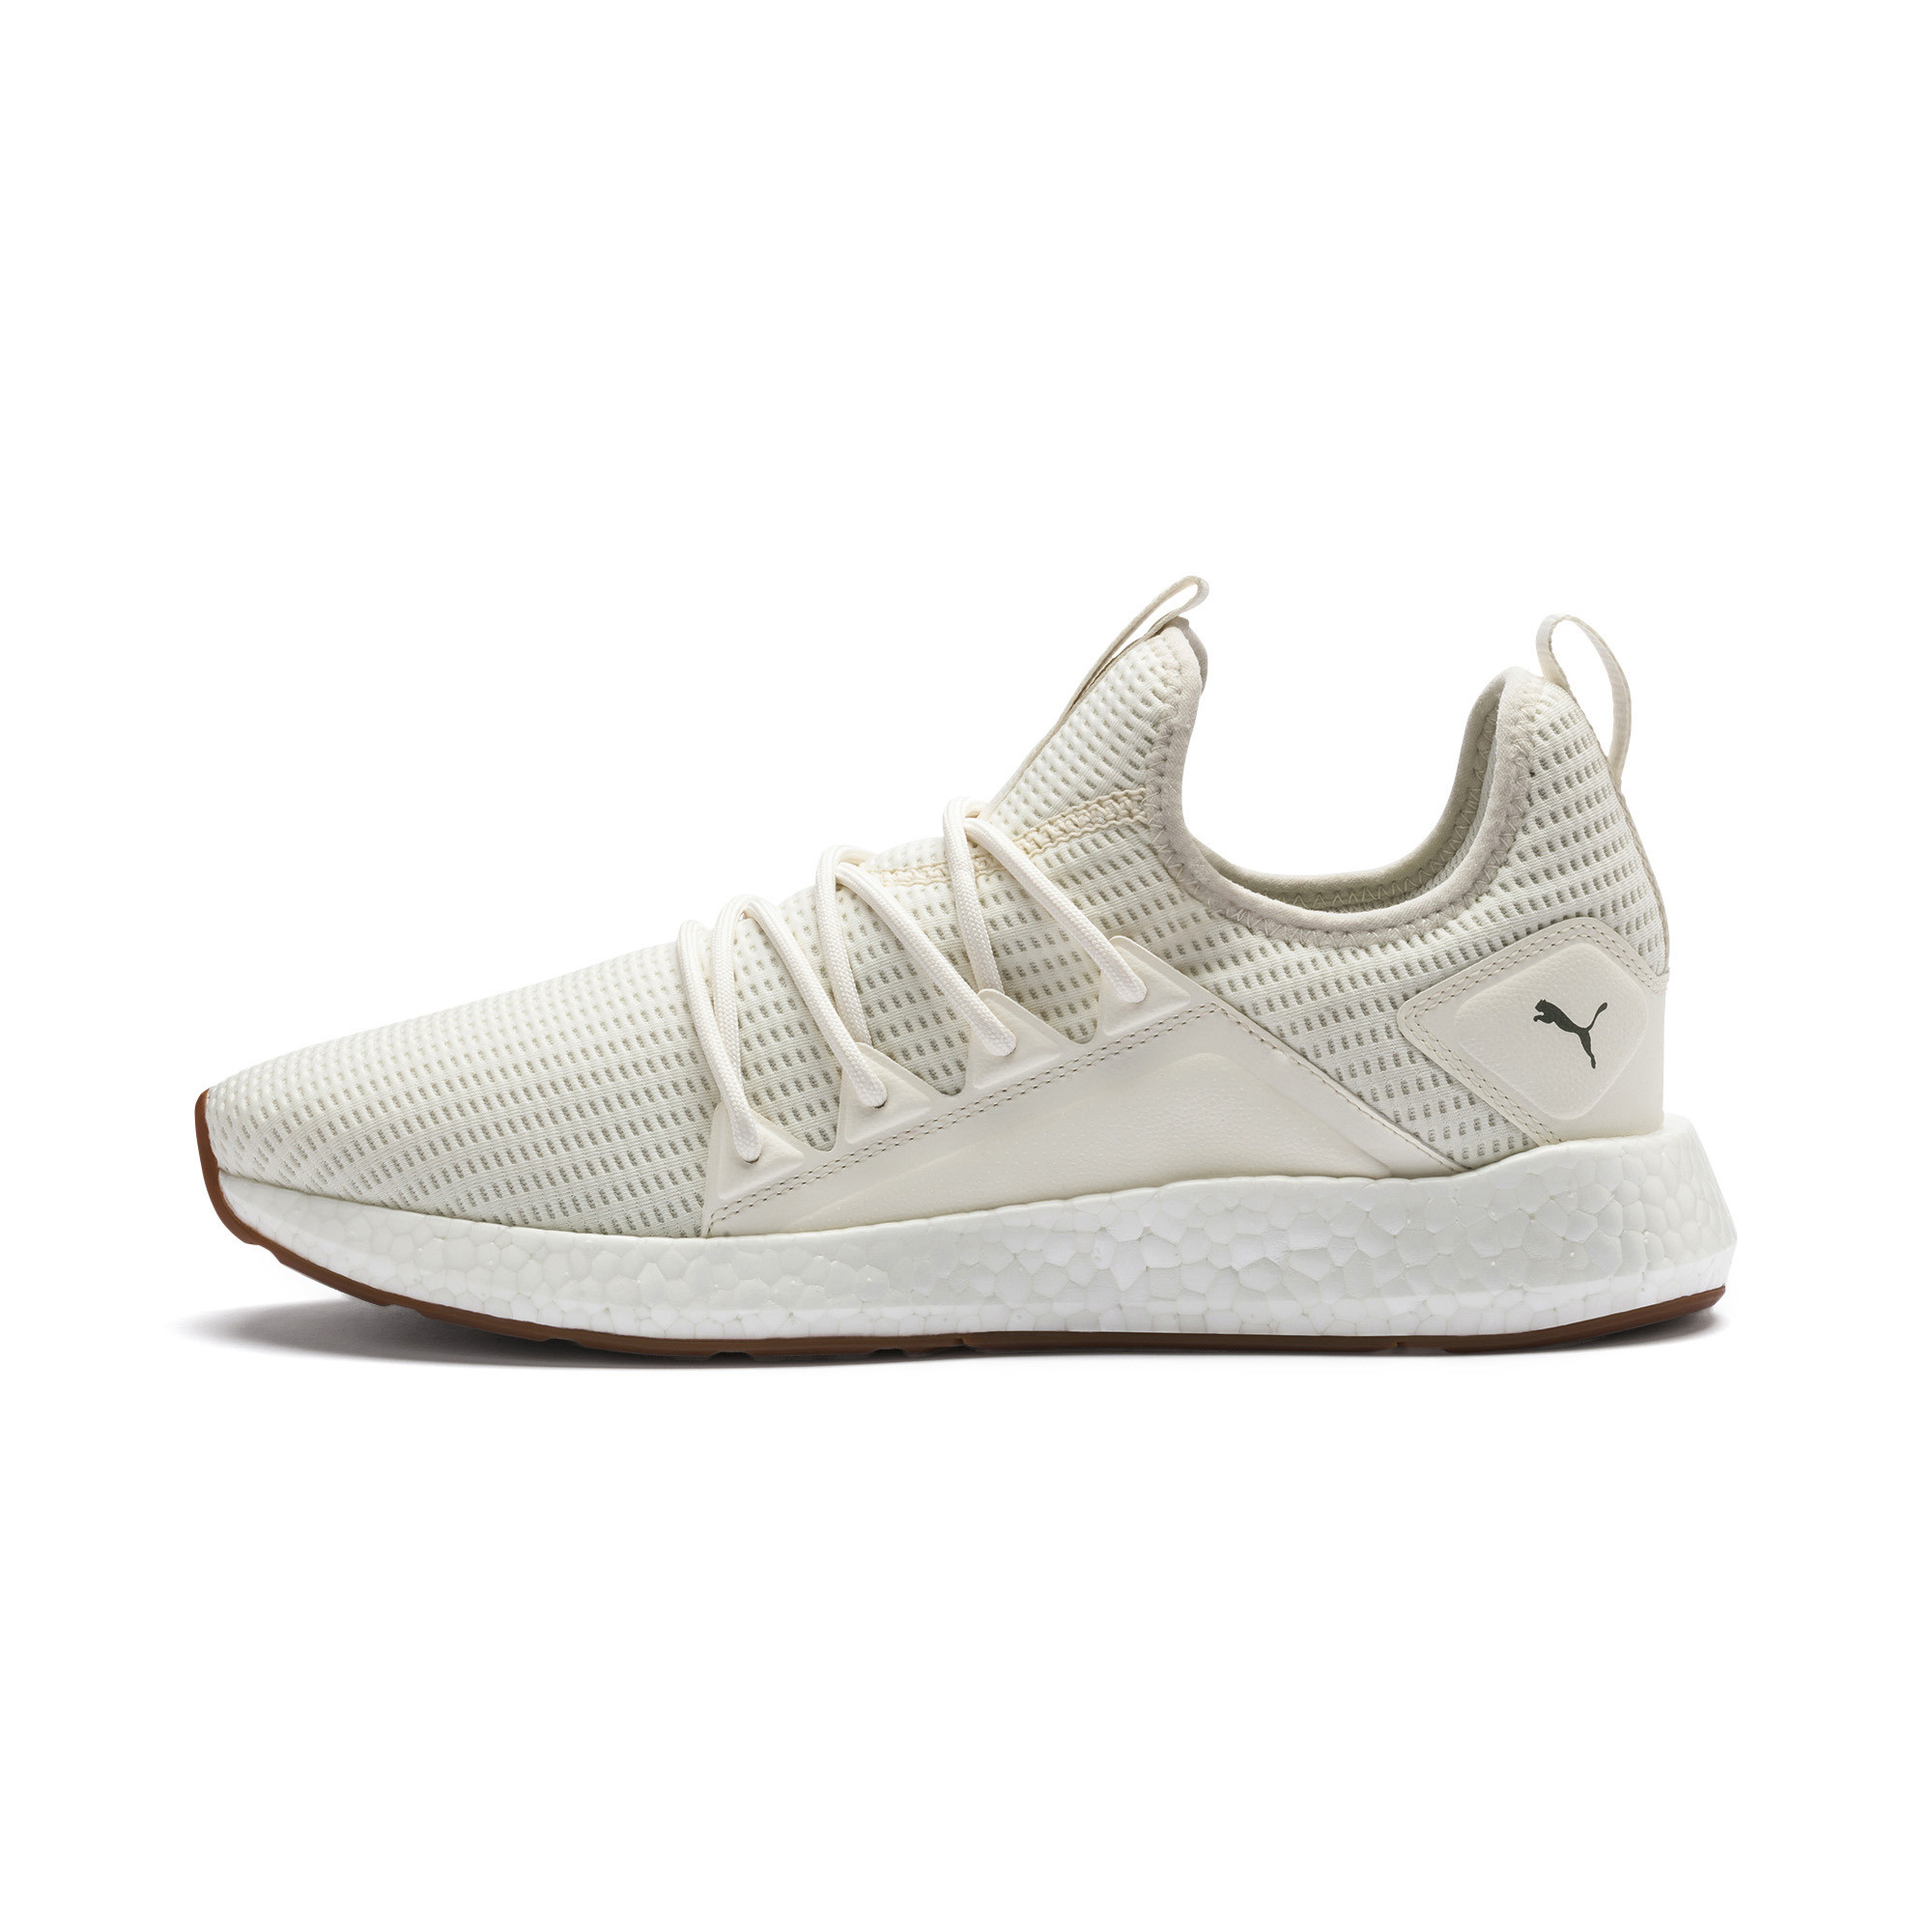 PUMA-NRGY-Neko-Future-Men-s-Running-Shoes-Men-Shoe-Running thumbnail 4